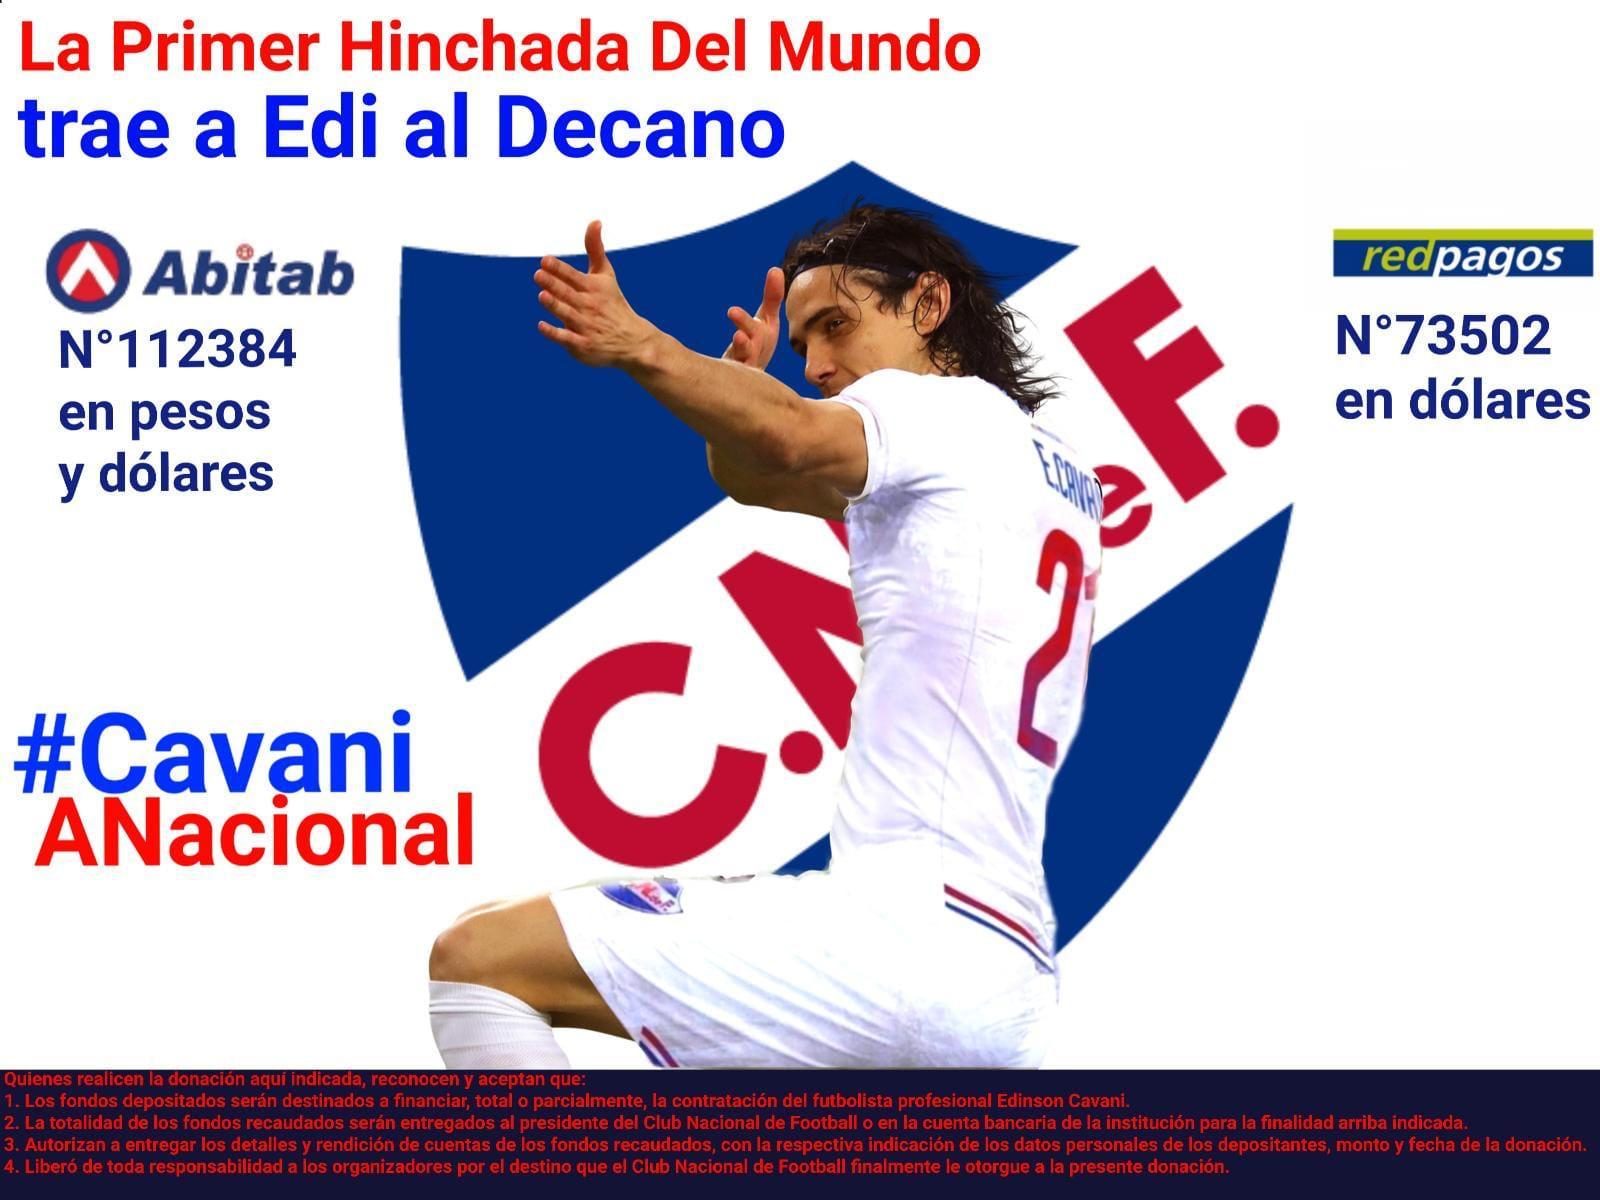 Cavani Nacional